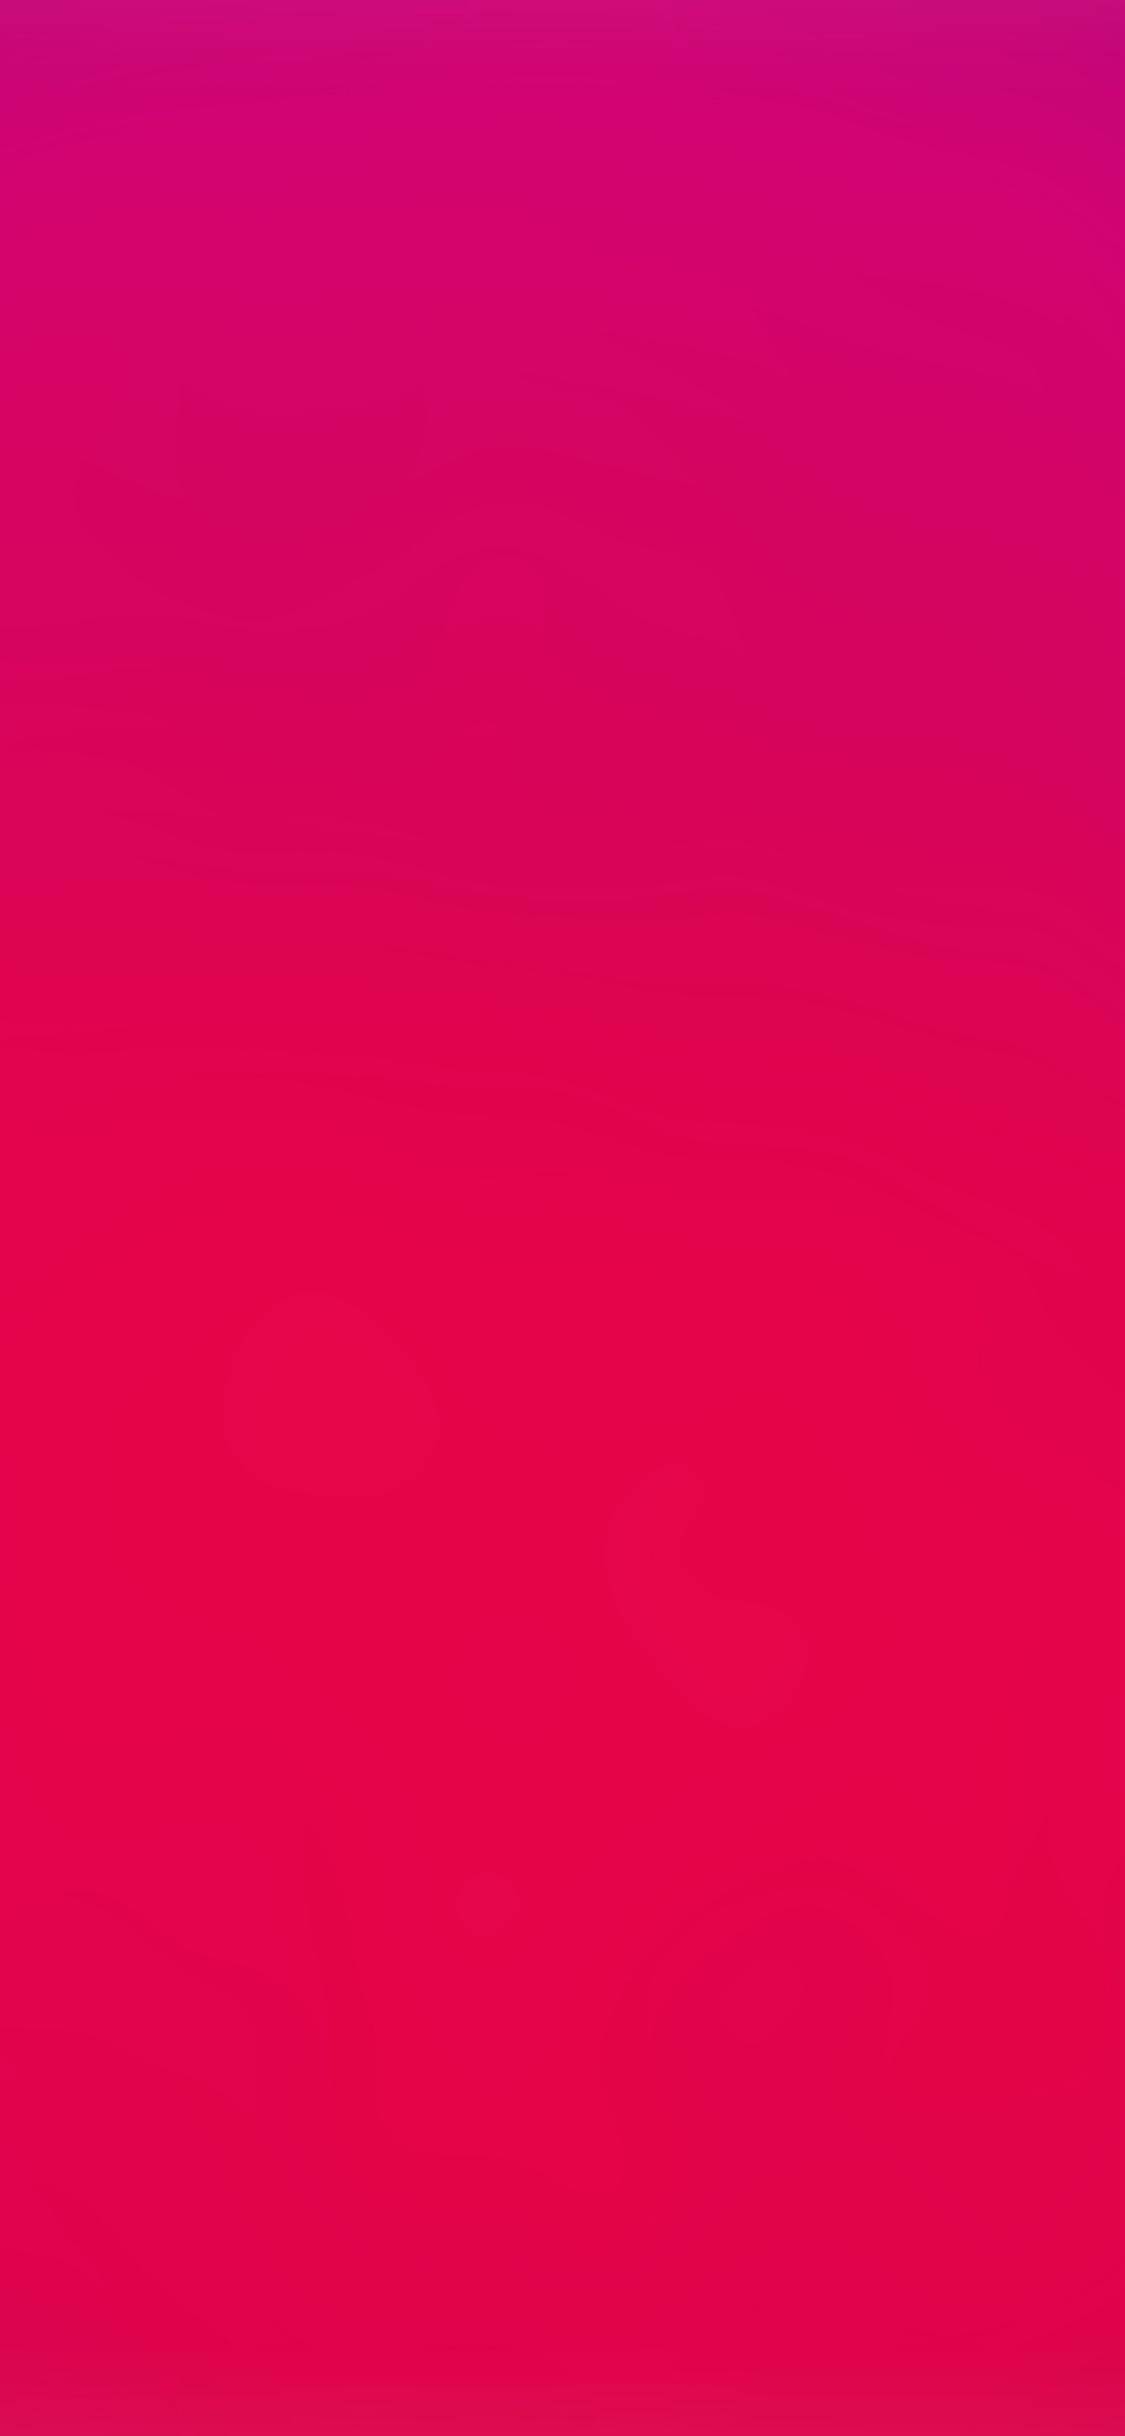 iPhoneXpapers.com-Apple-iPhone-wallpaper-sk19-red-violet-hot-blur-gradation